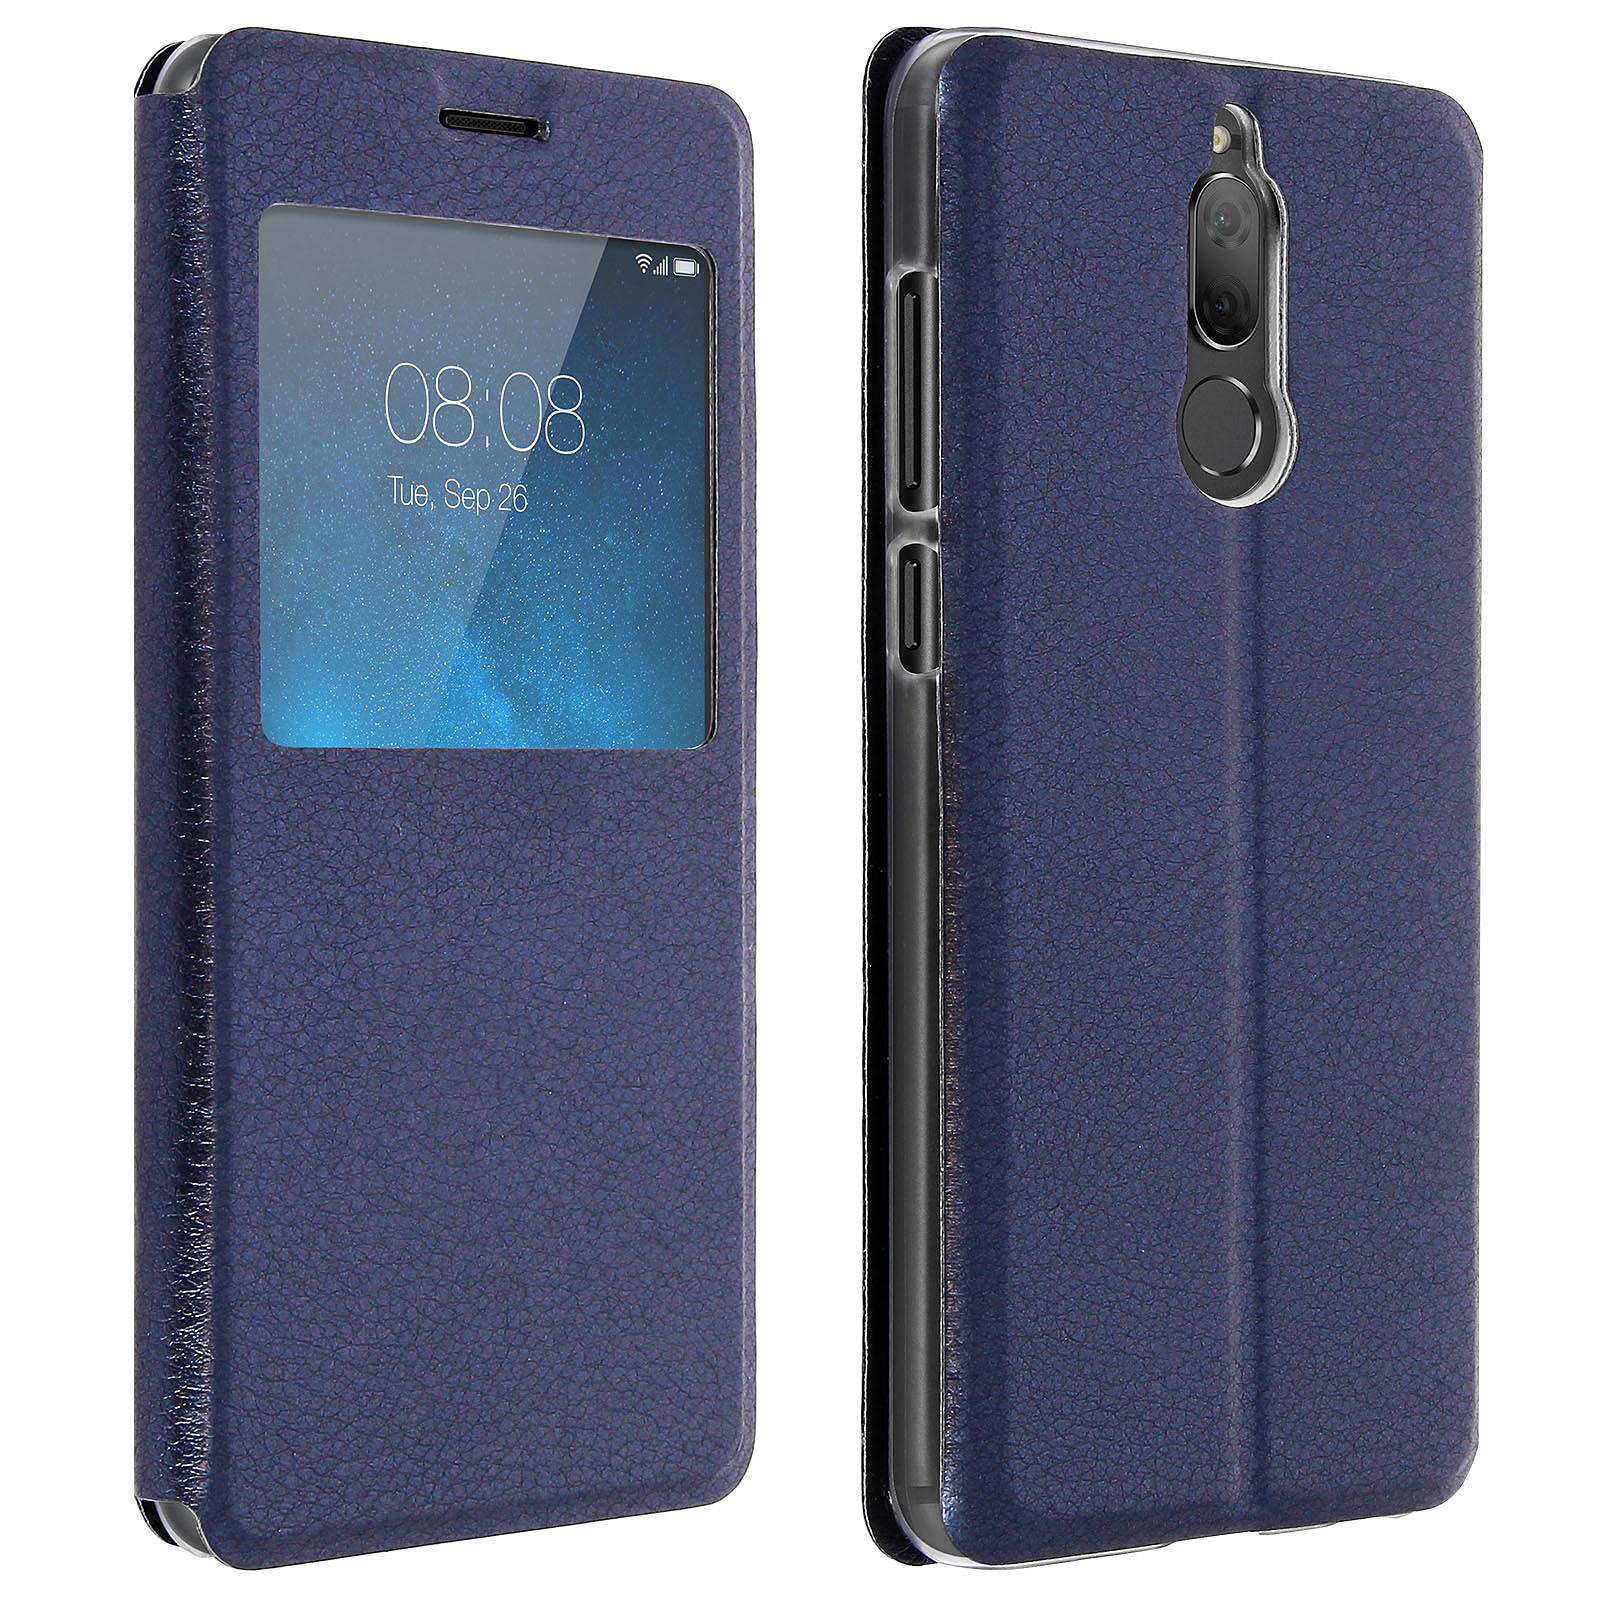 Avizar Etui folio Bleu Nuit pour Huawei Mate 10 Lite